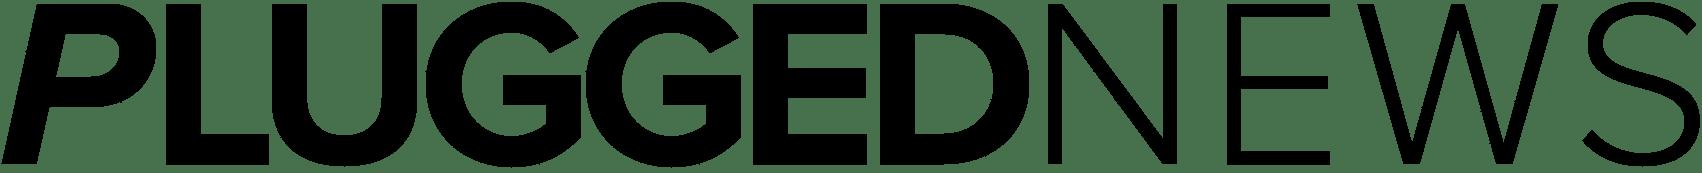 PLUGGEDNEWS-TYPEWEB-min